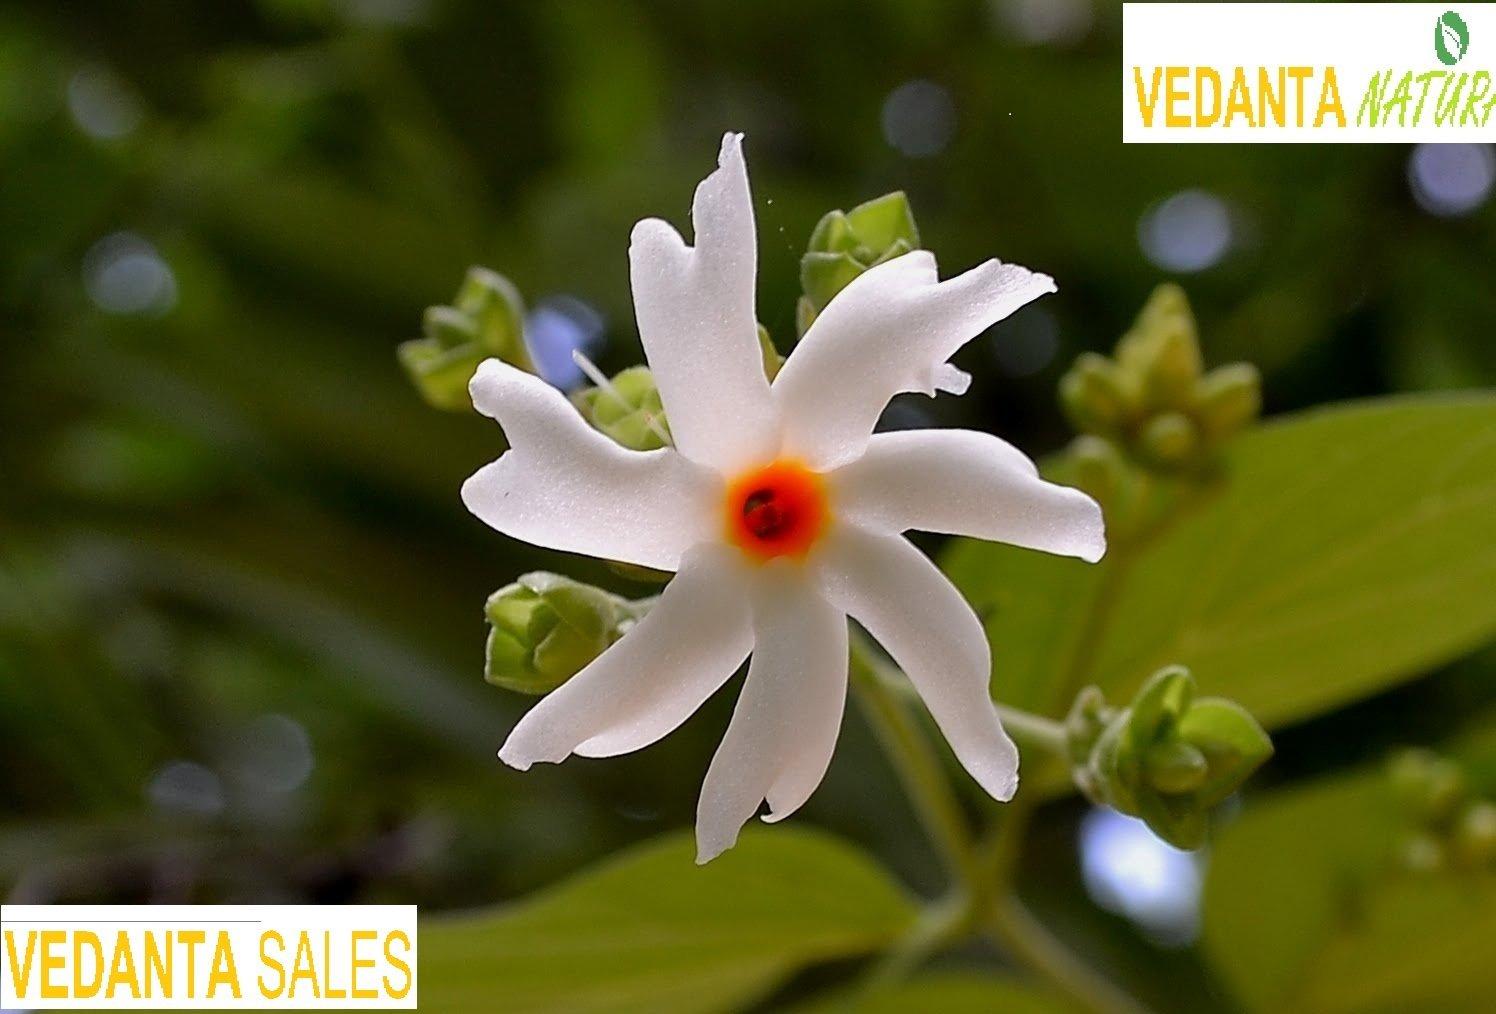 Vedanta sales live coral jasmine plant night flowering parijat plant vedanta sales live coral jasmine plant night flowering parijat plantpot included amazon garden outdoors izmirmasajfo